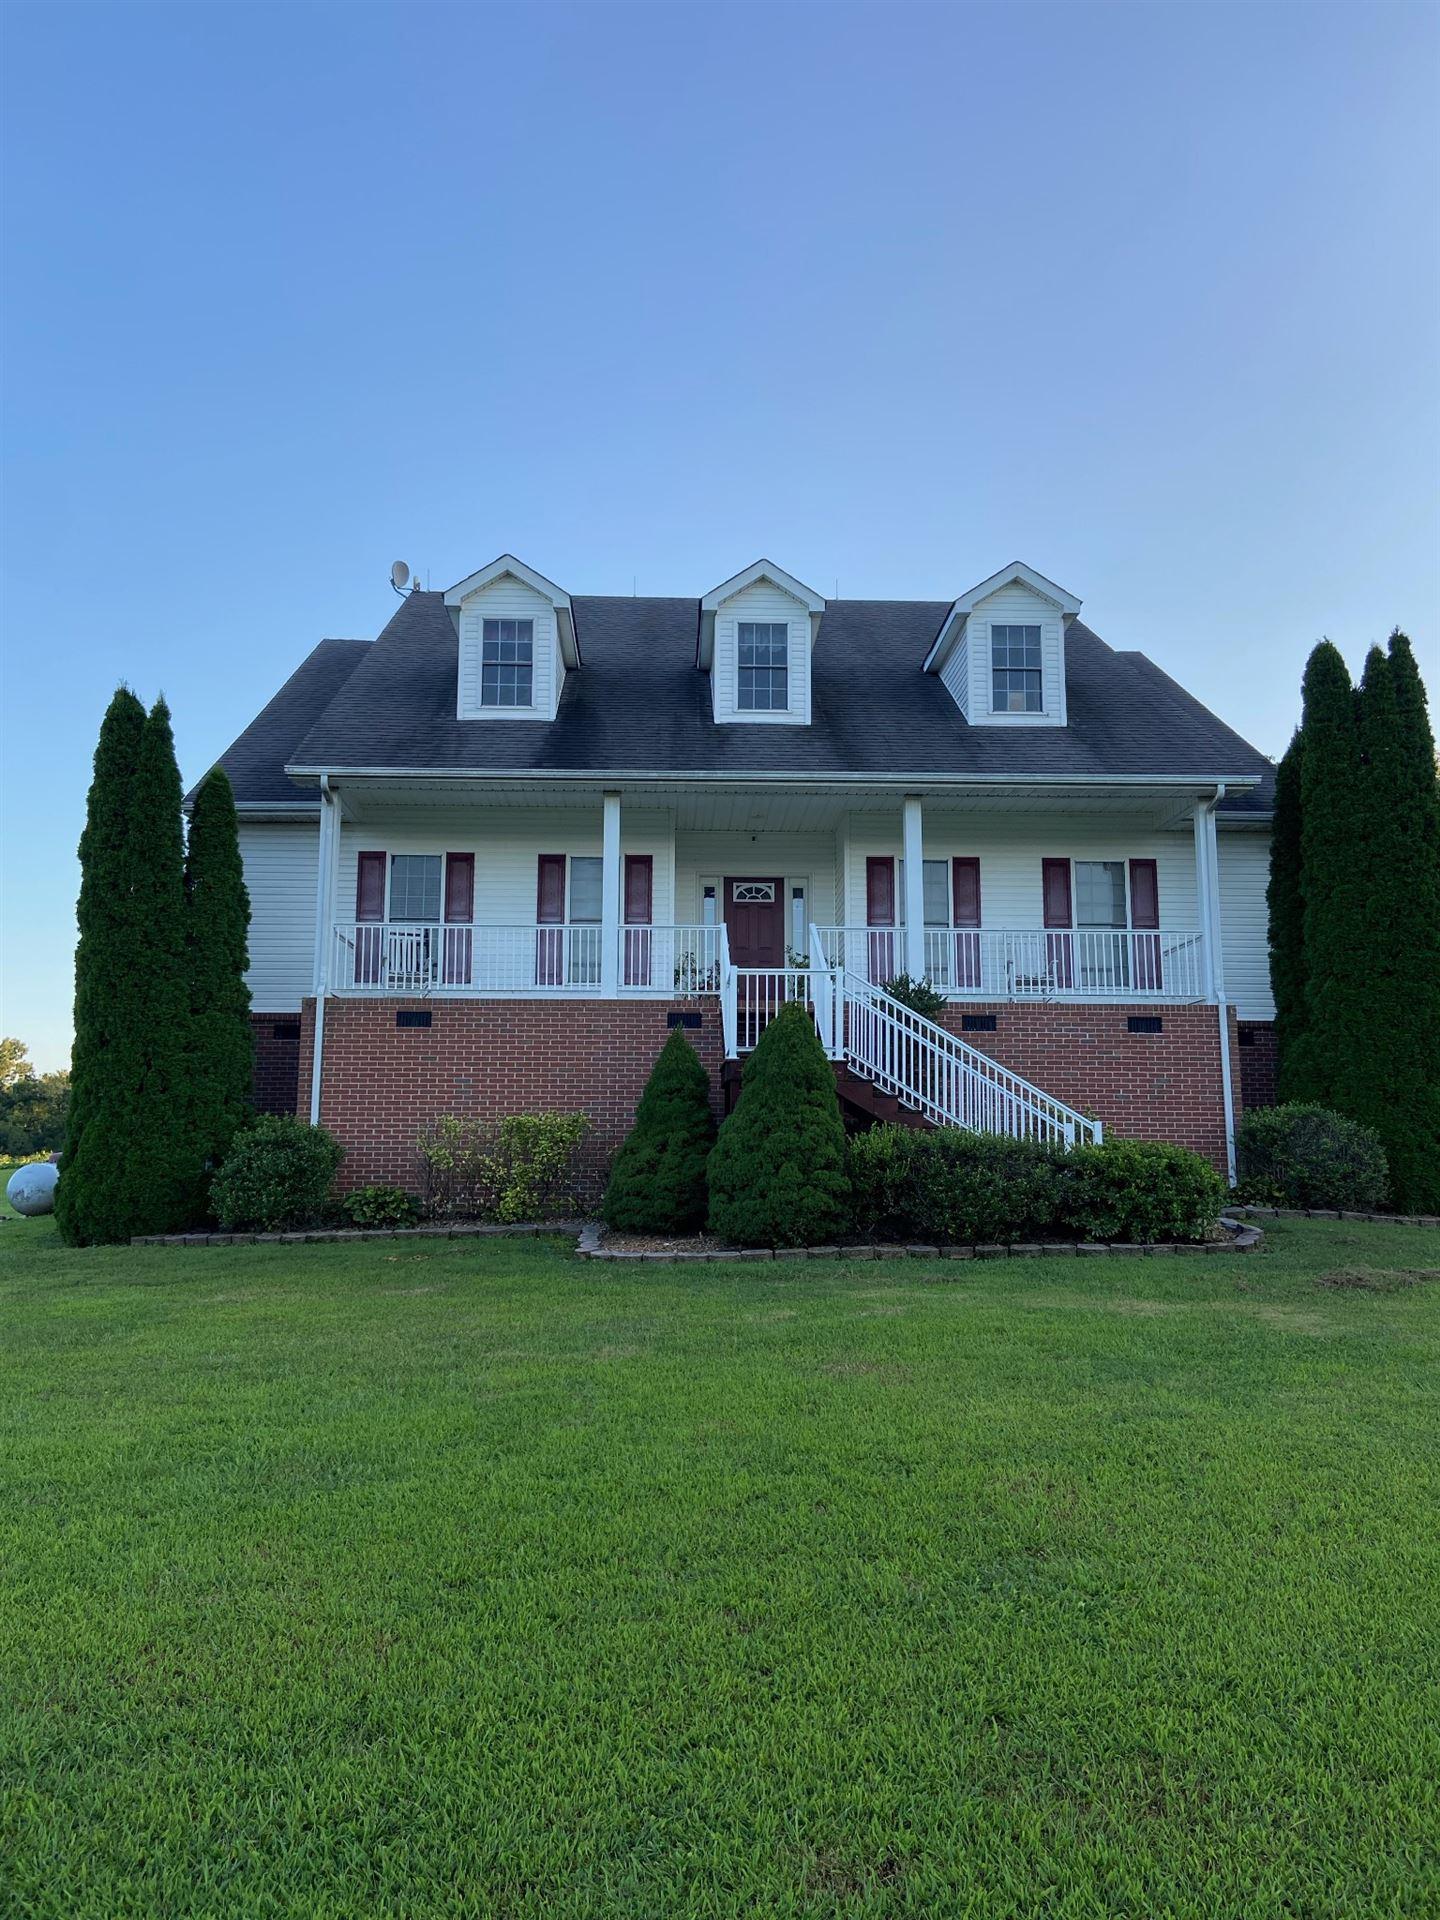 305 Darnell Ridge Rd, Mulberry, TN 37359 - MLS#: 2288057